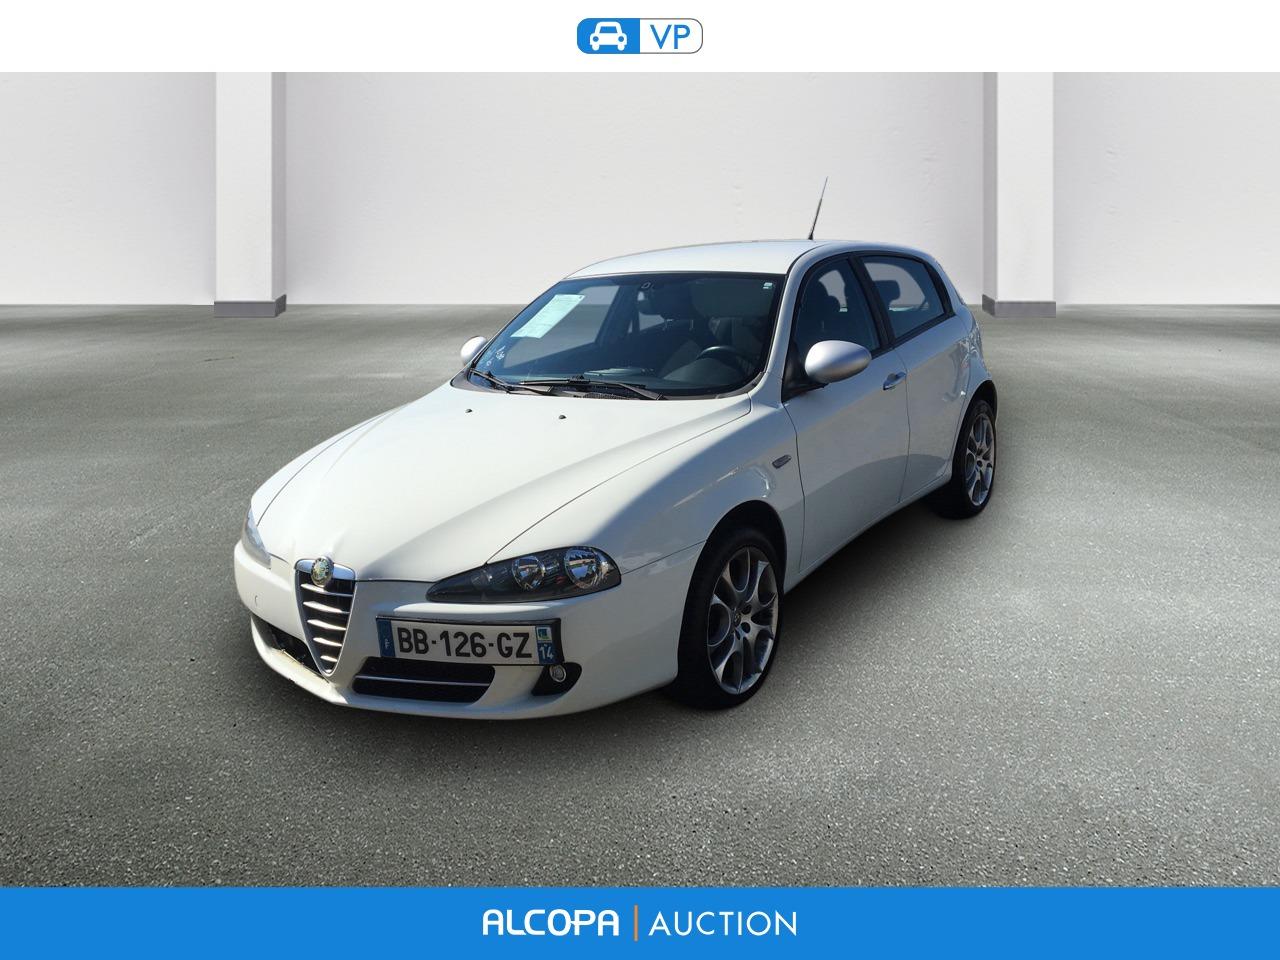 Alfa Romeo 147 147 1 9 Jtdm 120 Centenario Alcopa Auction